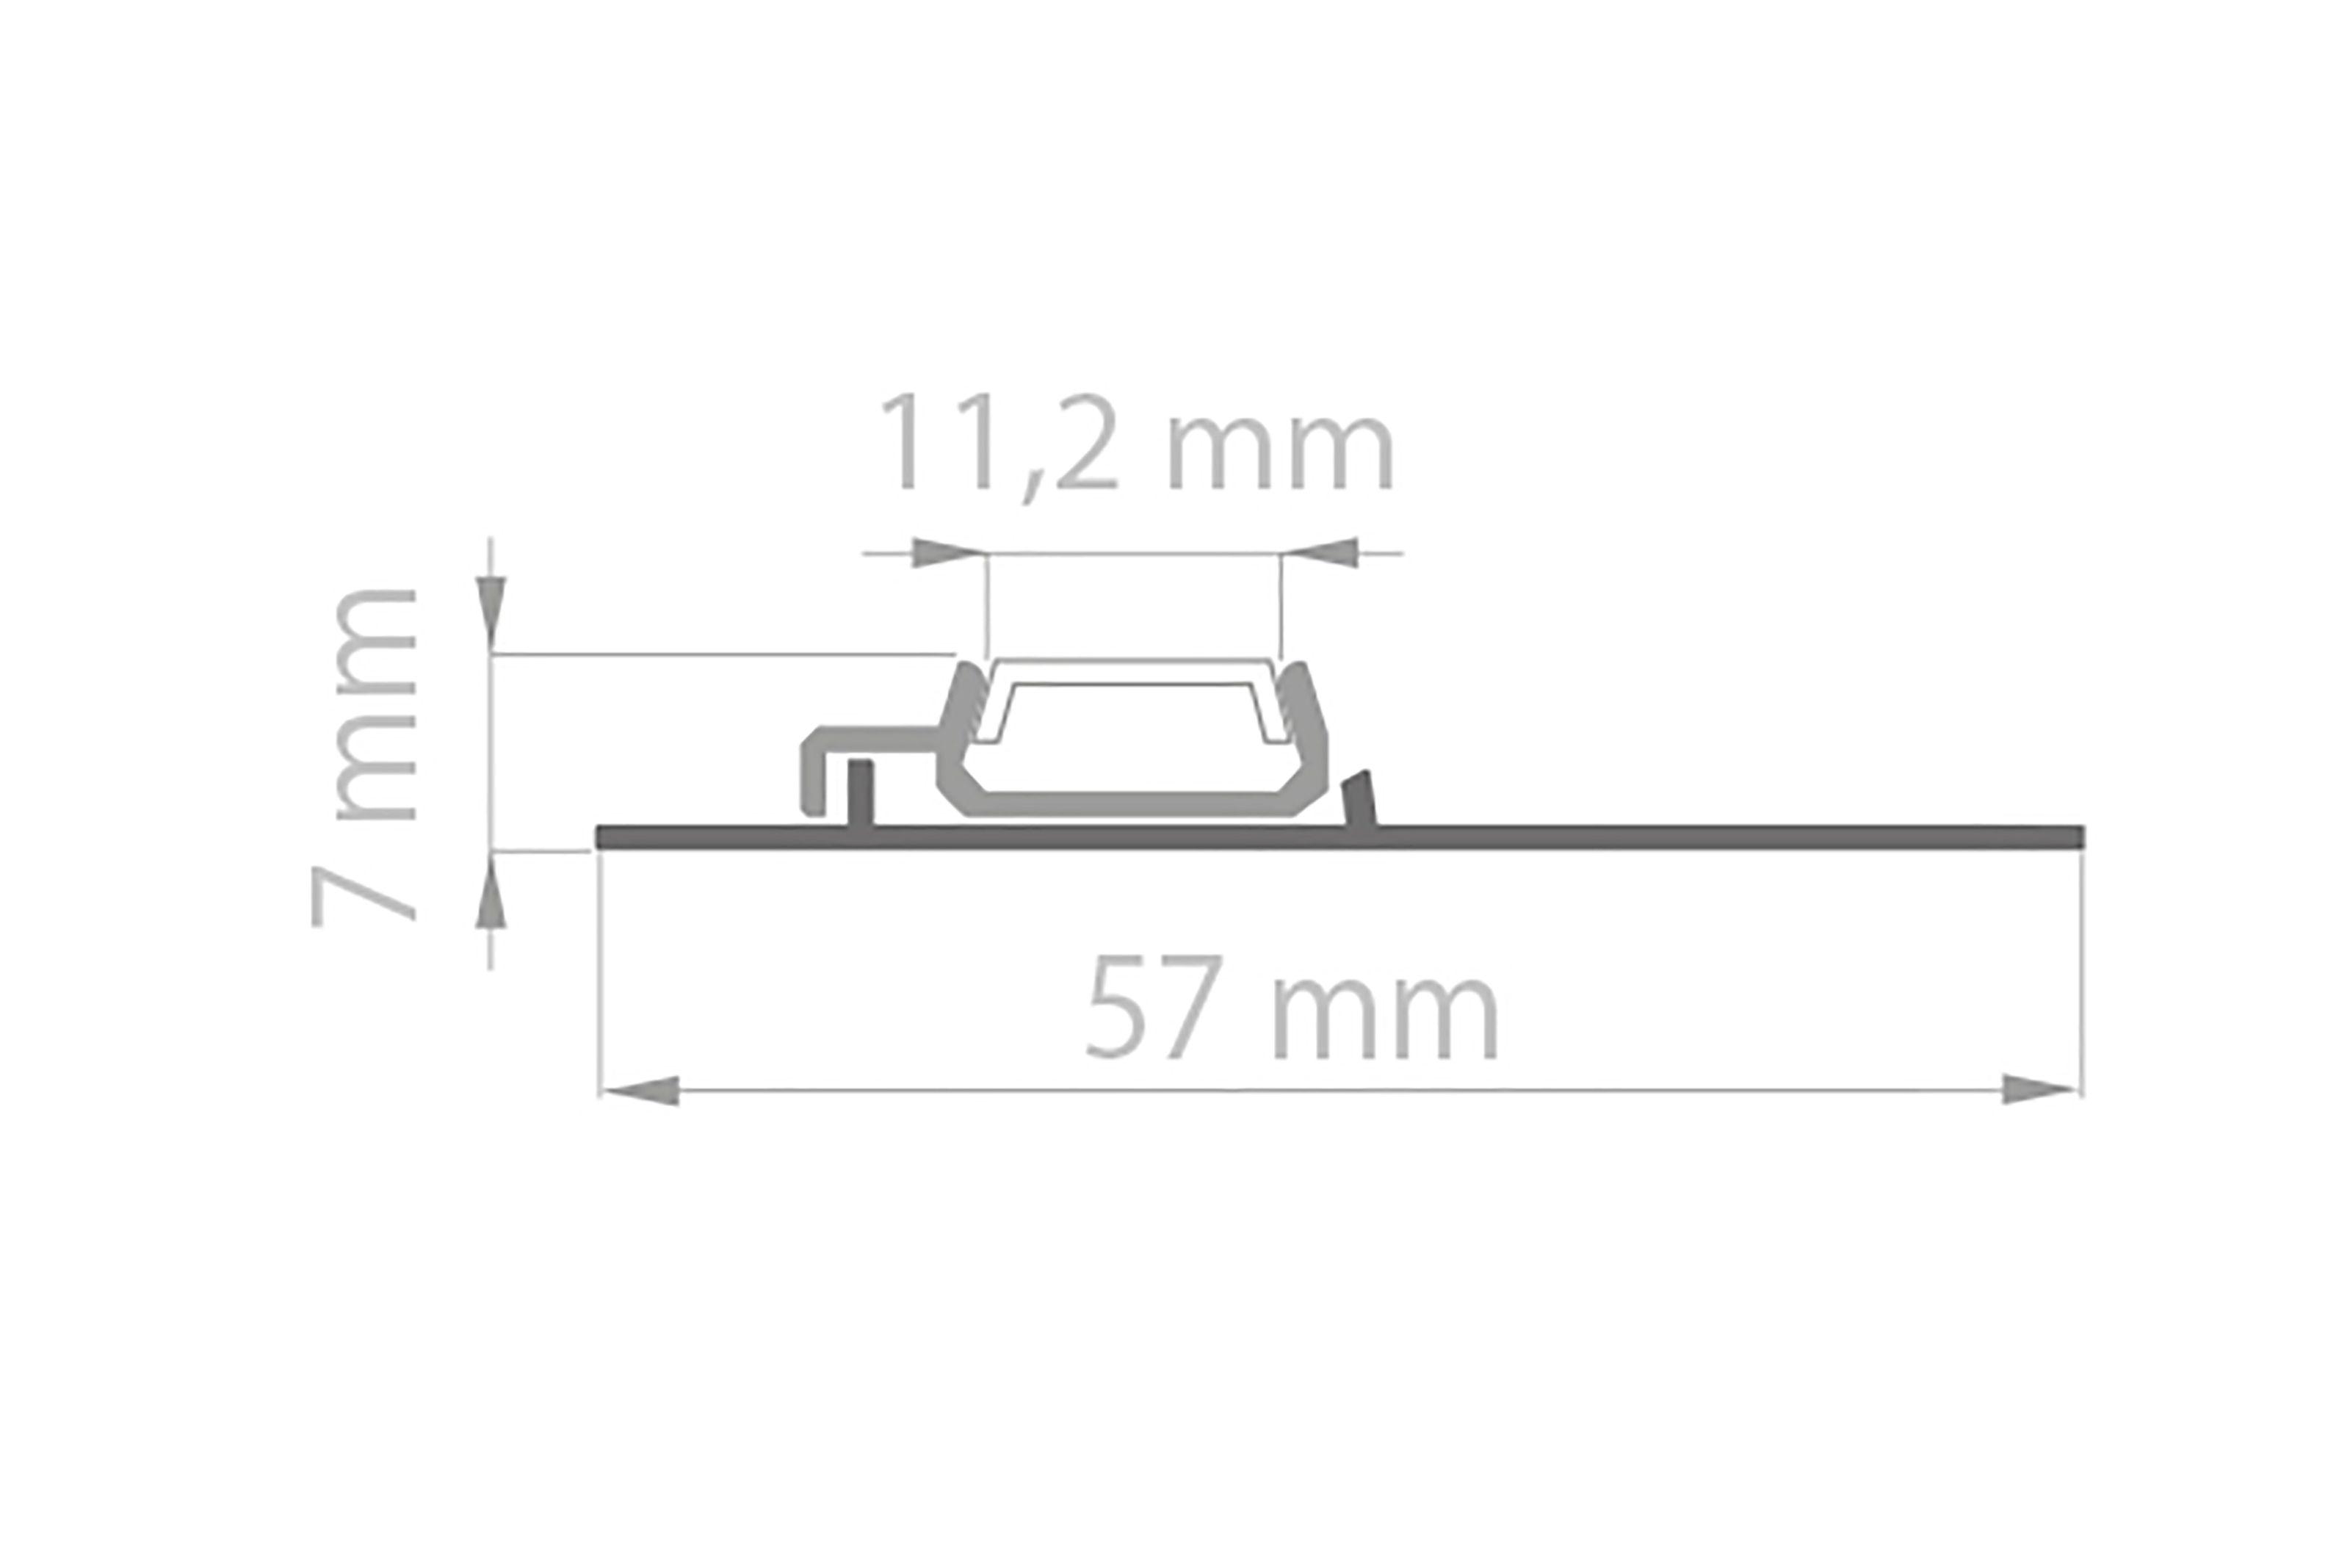 lightline-cala-f-5-mj-lighting-v2